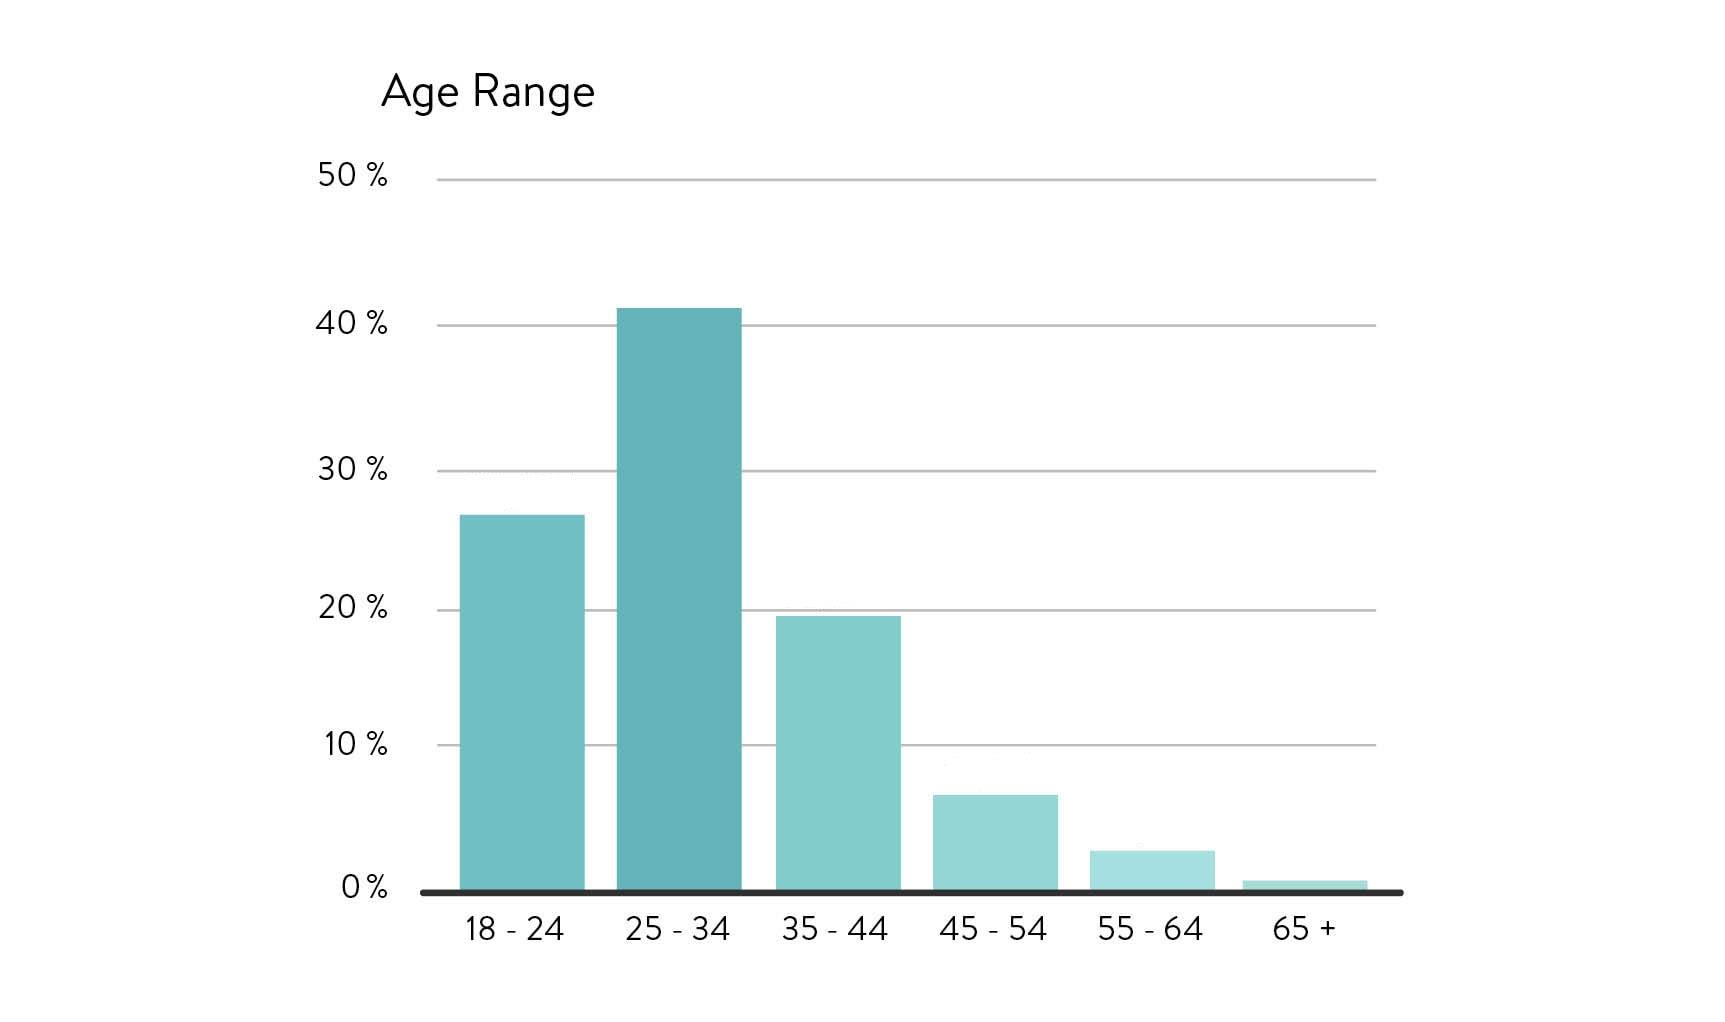 ABLS Age Demographics